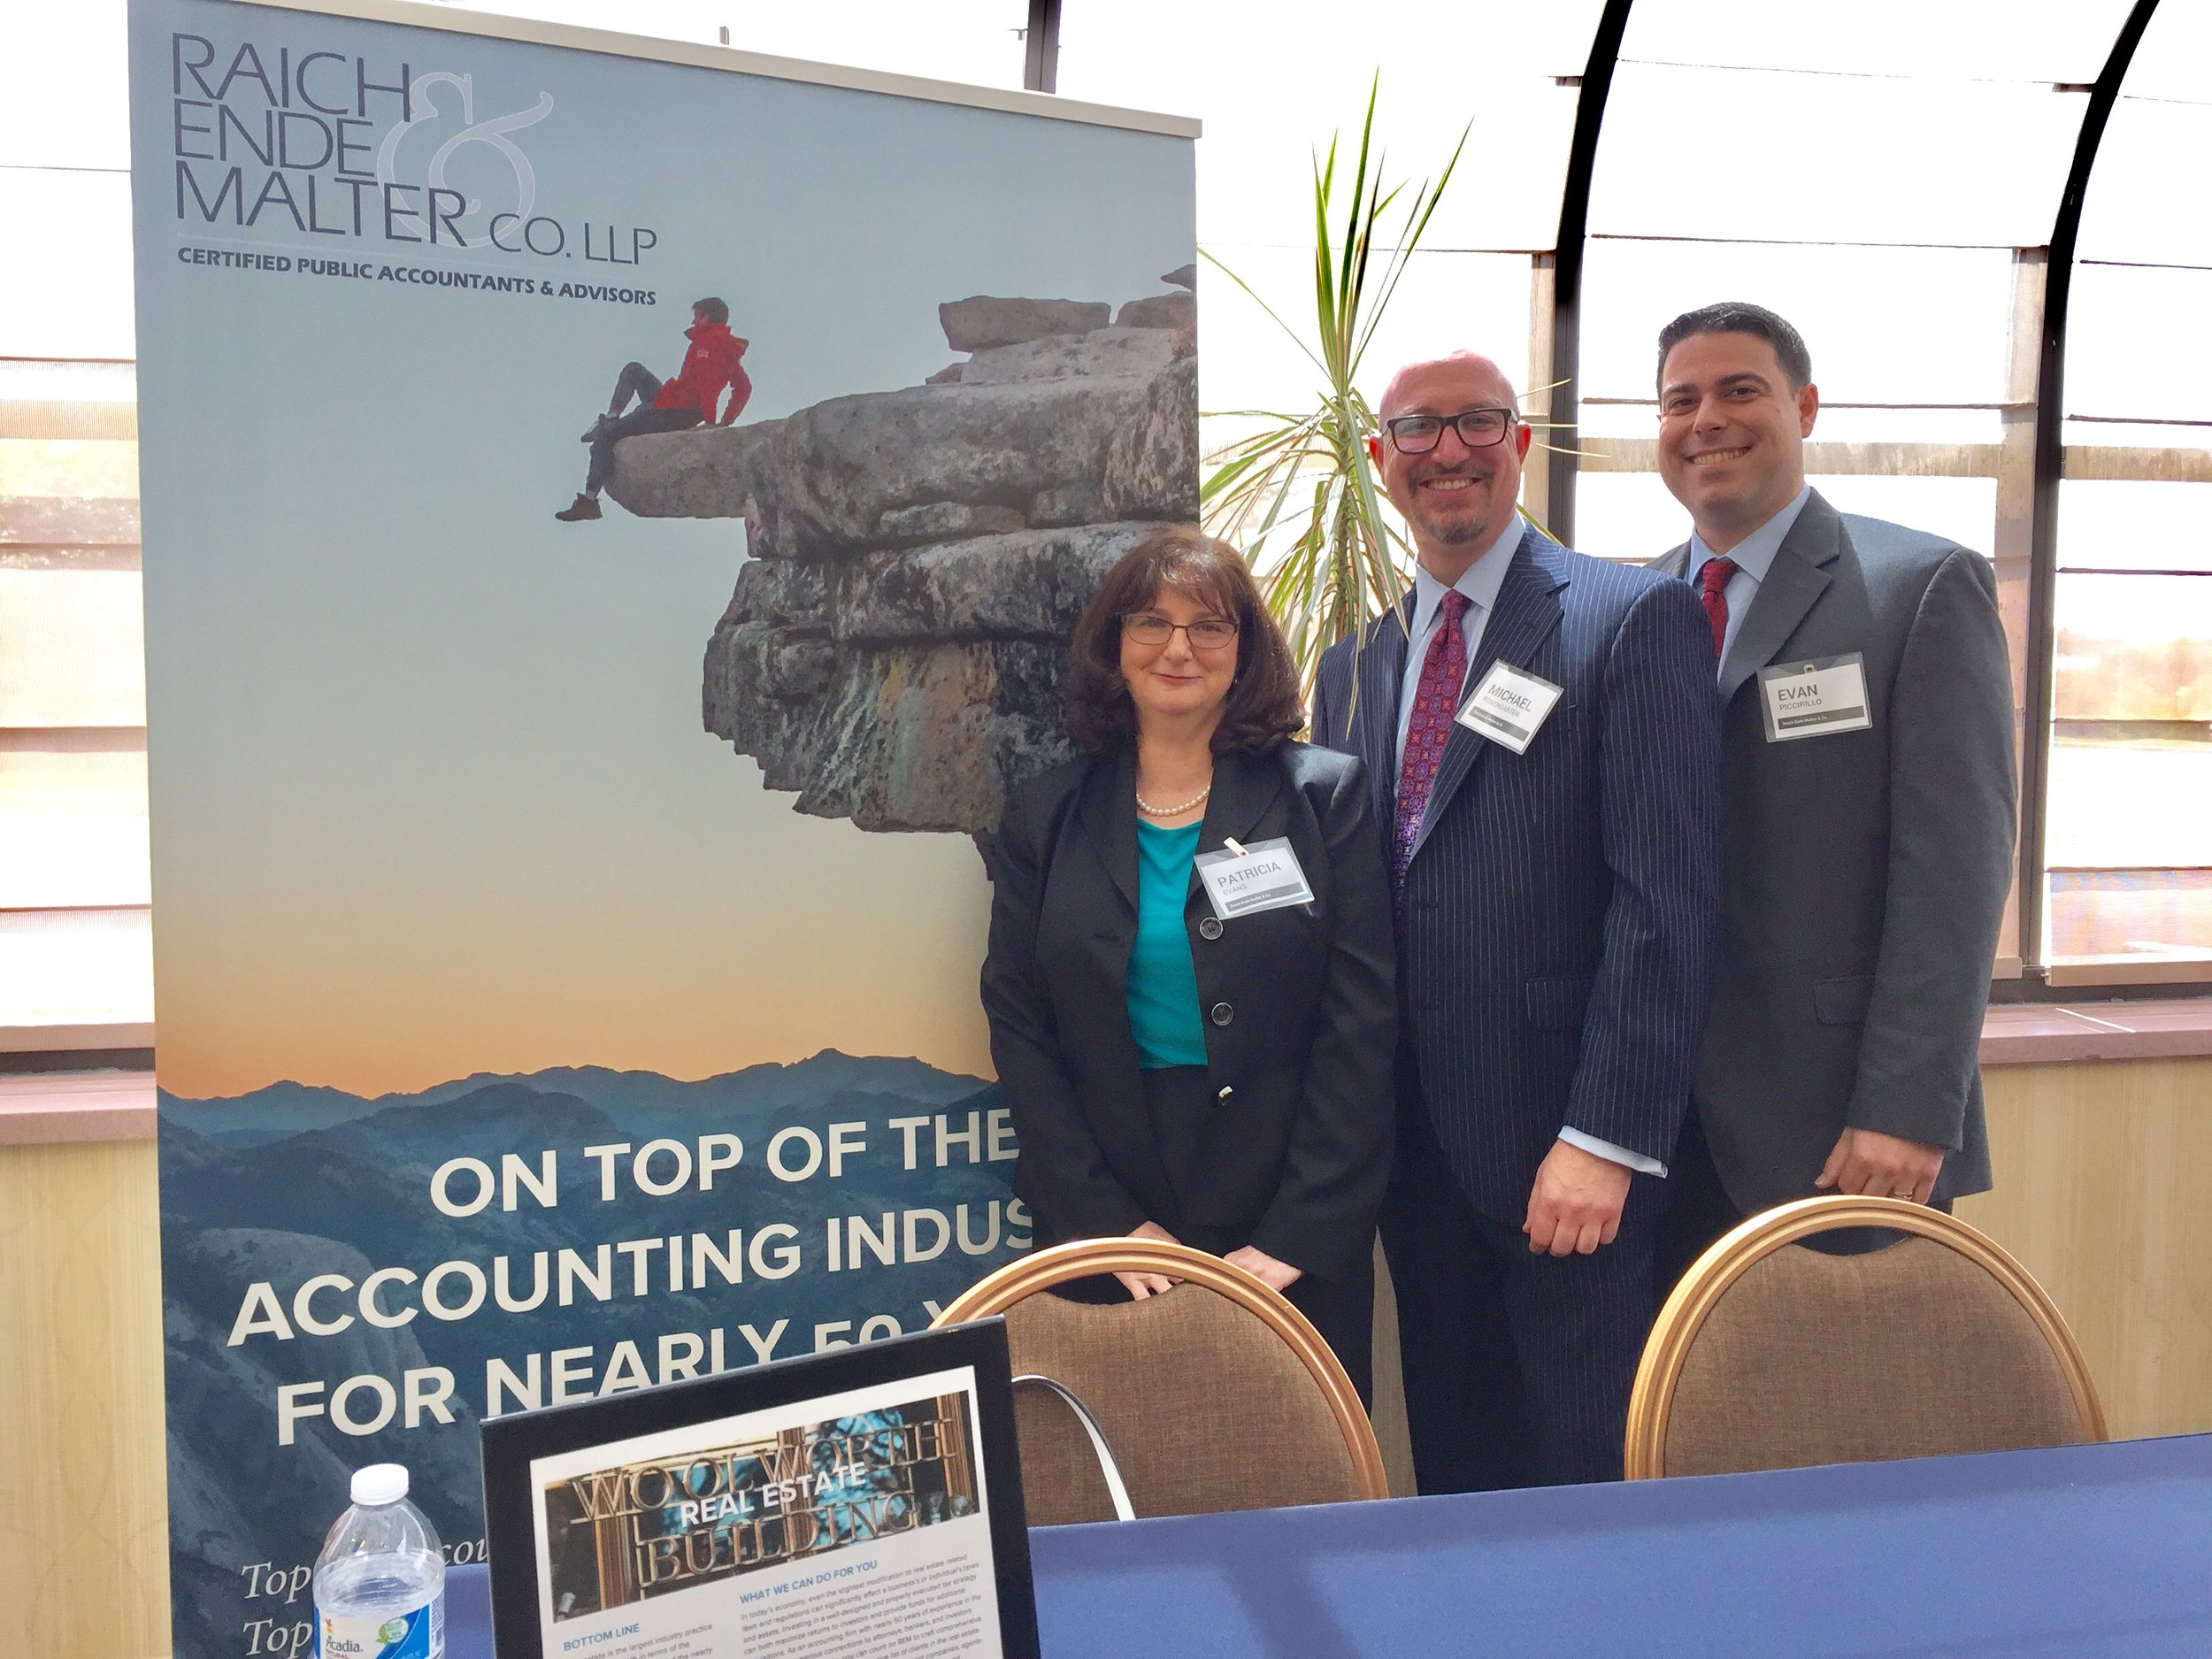 Senior tax manager Patricia Evans, partner Michael Rosengarten, and tax supervisor Evan Piccirillo.